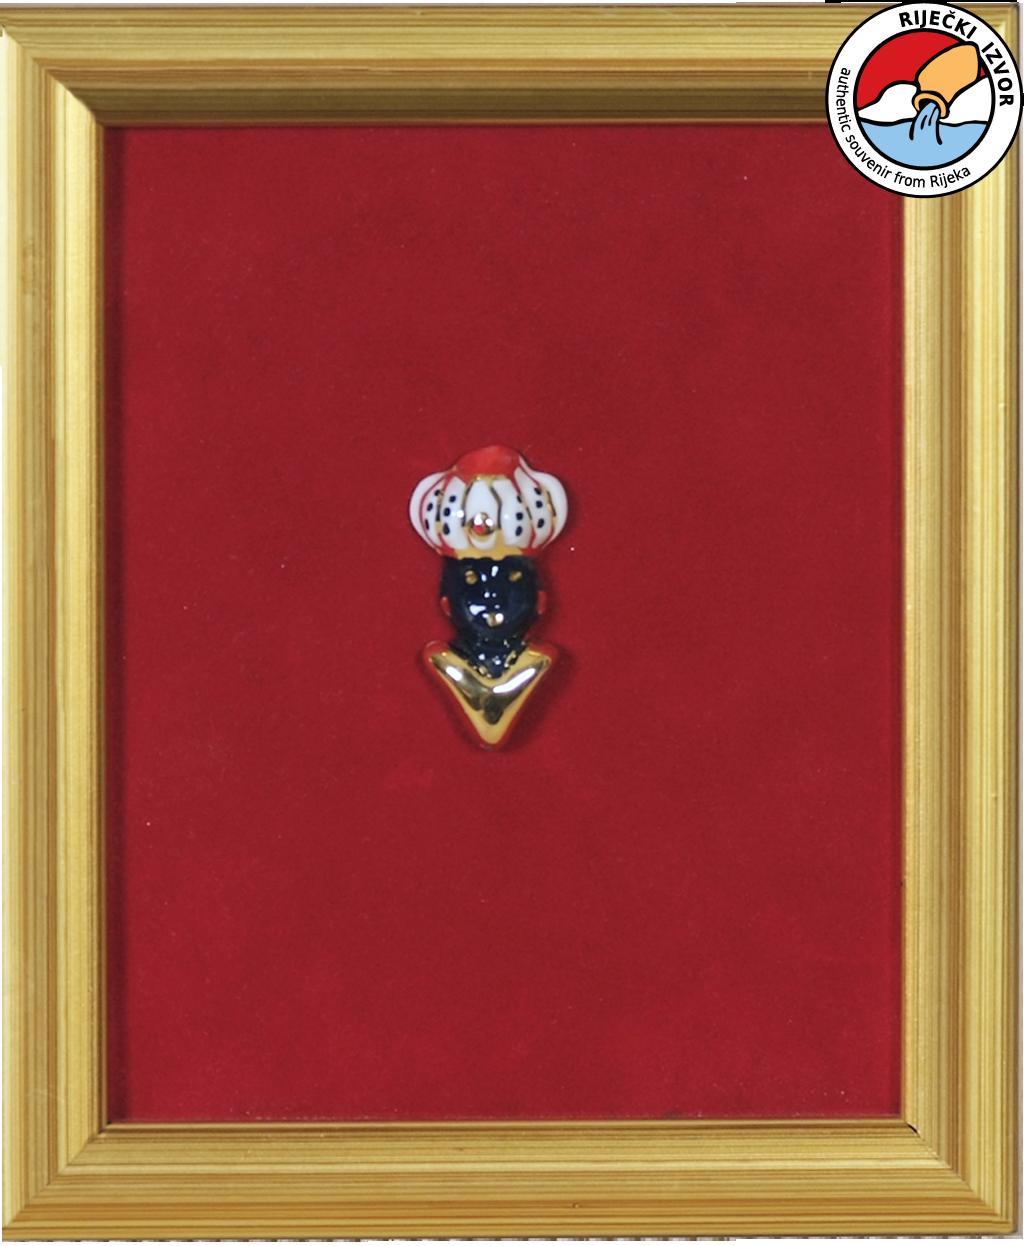 MORČIĆ - uokvireni keramički suvenir 13x15 cm